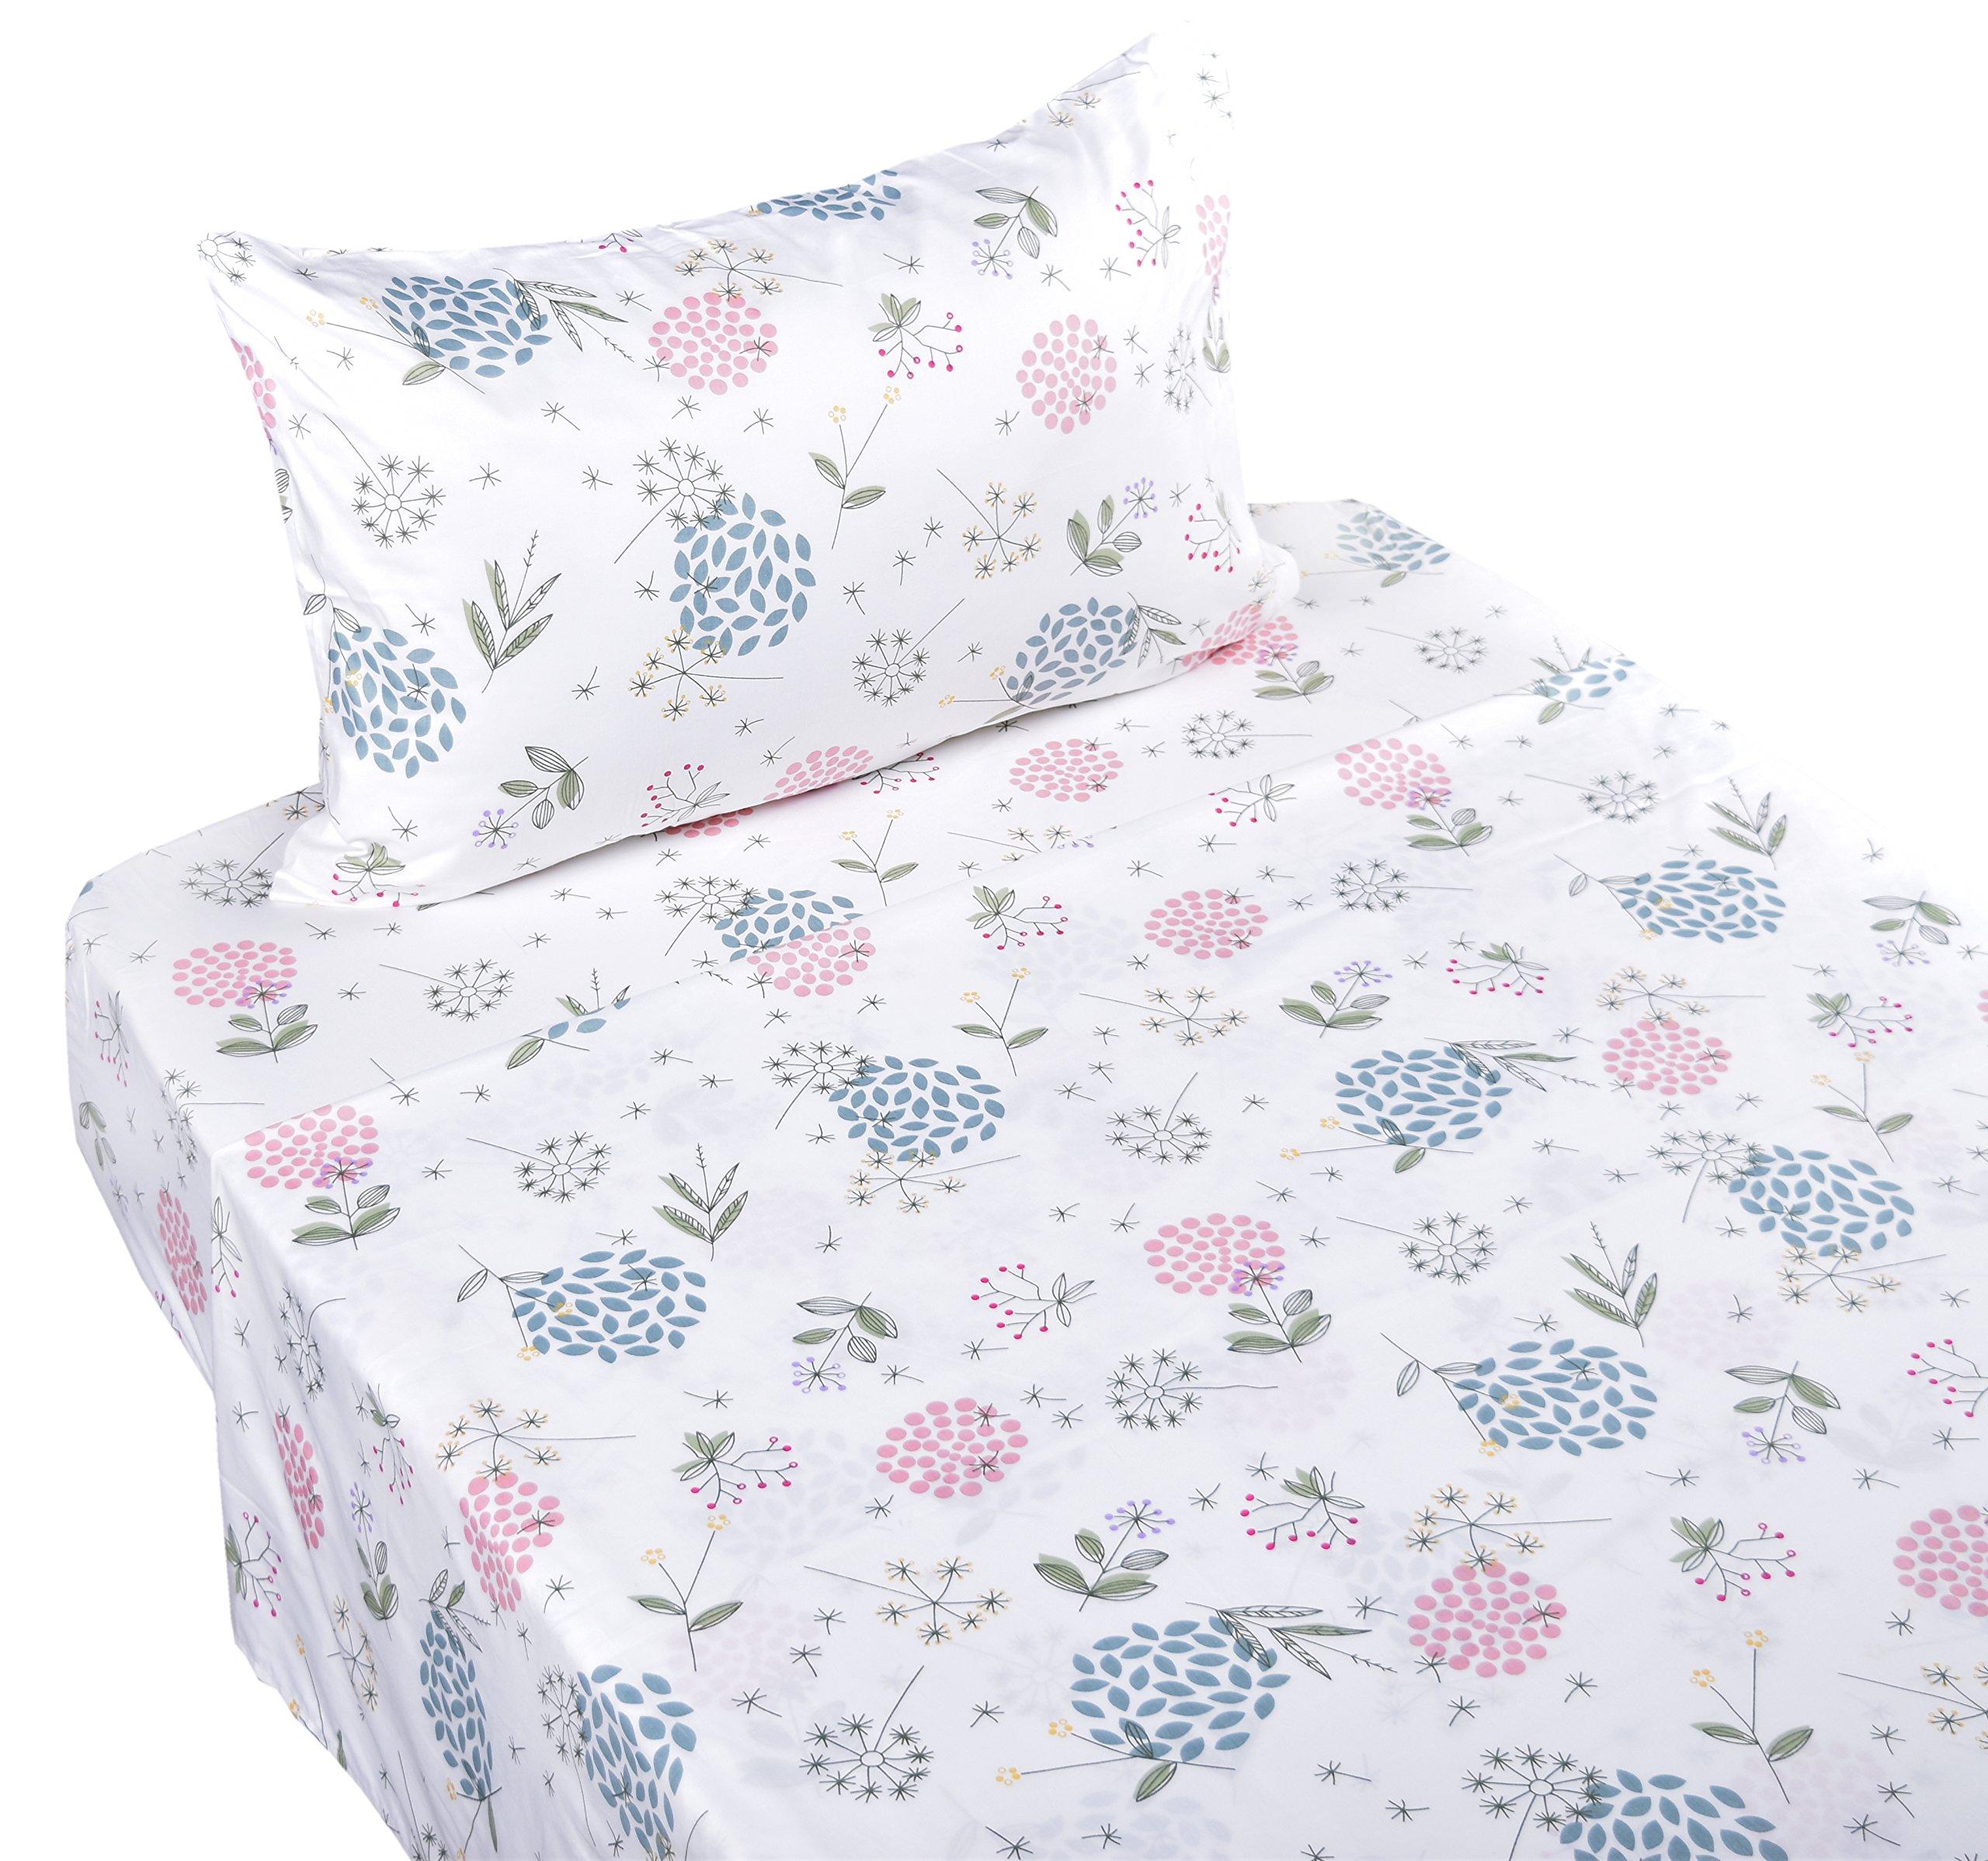 J-pinno Dandelion Flower Dancing in Wind Lovely Twin Sheet Set for Kids Boys Girls Children,100% Cotton, Flat Sheet + Fitted Sheet + Pillowcase Bedding Set